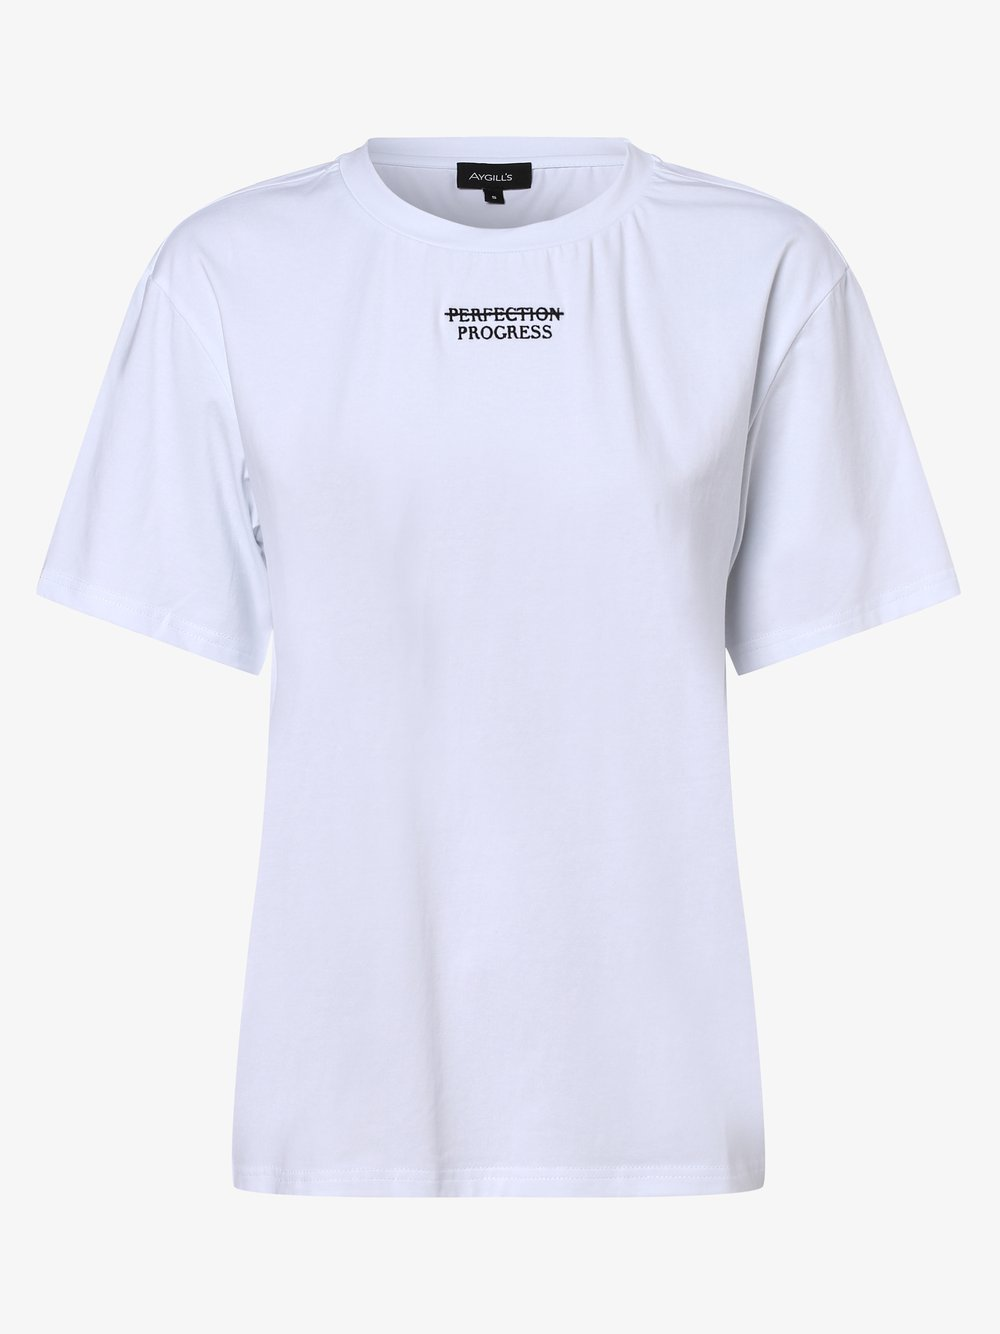 Aygill's - T-shirt damski, biały